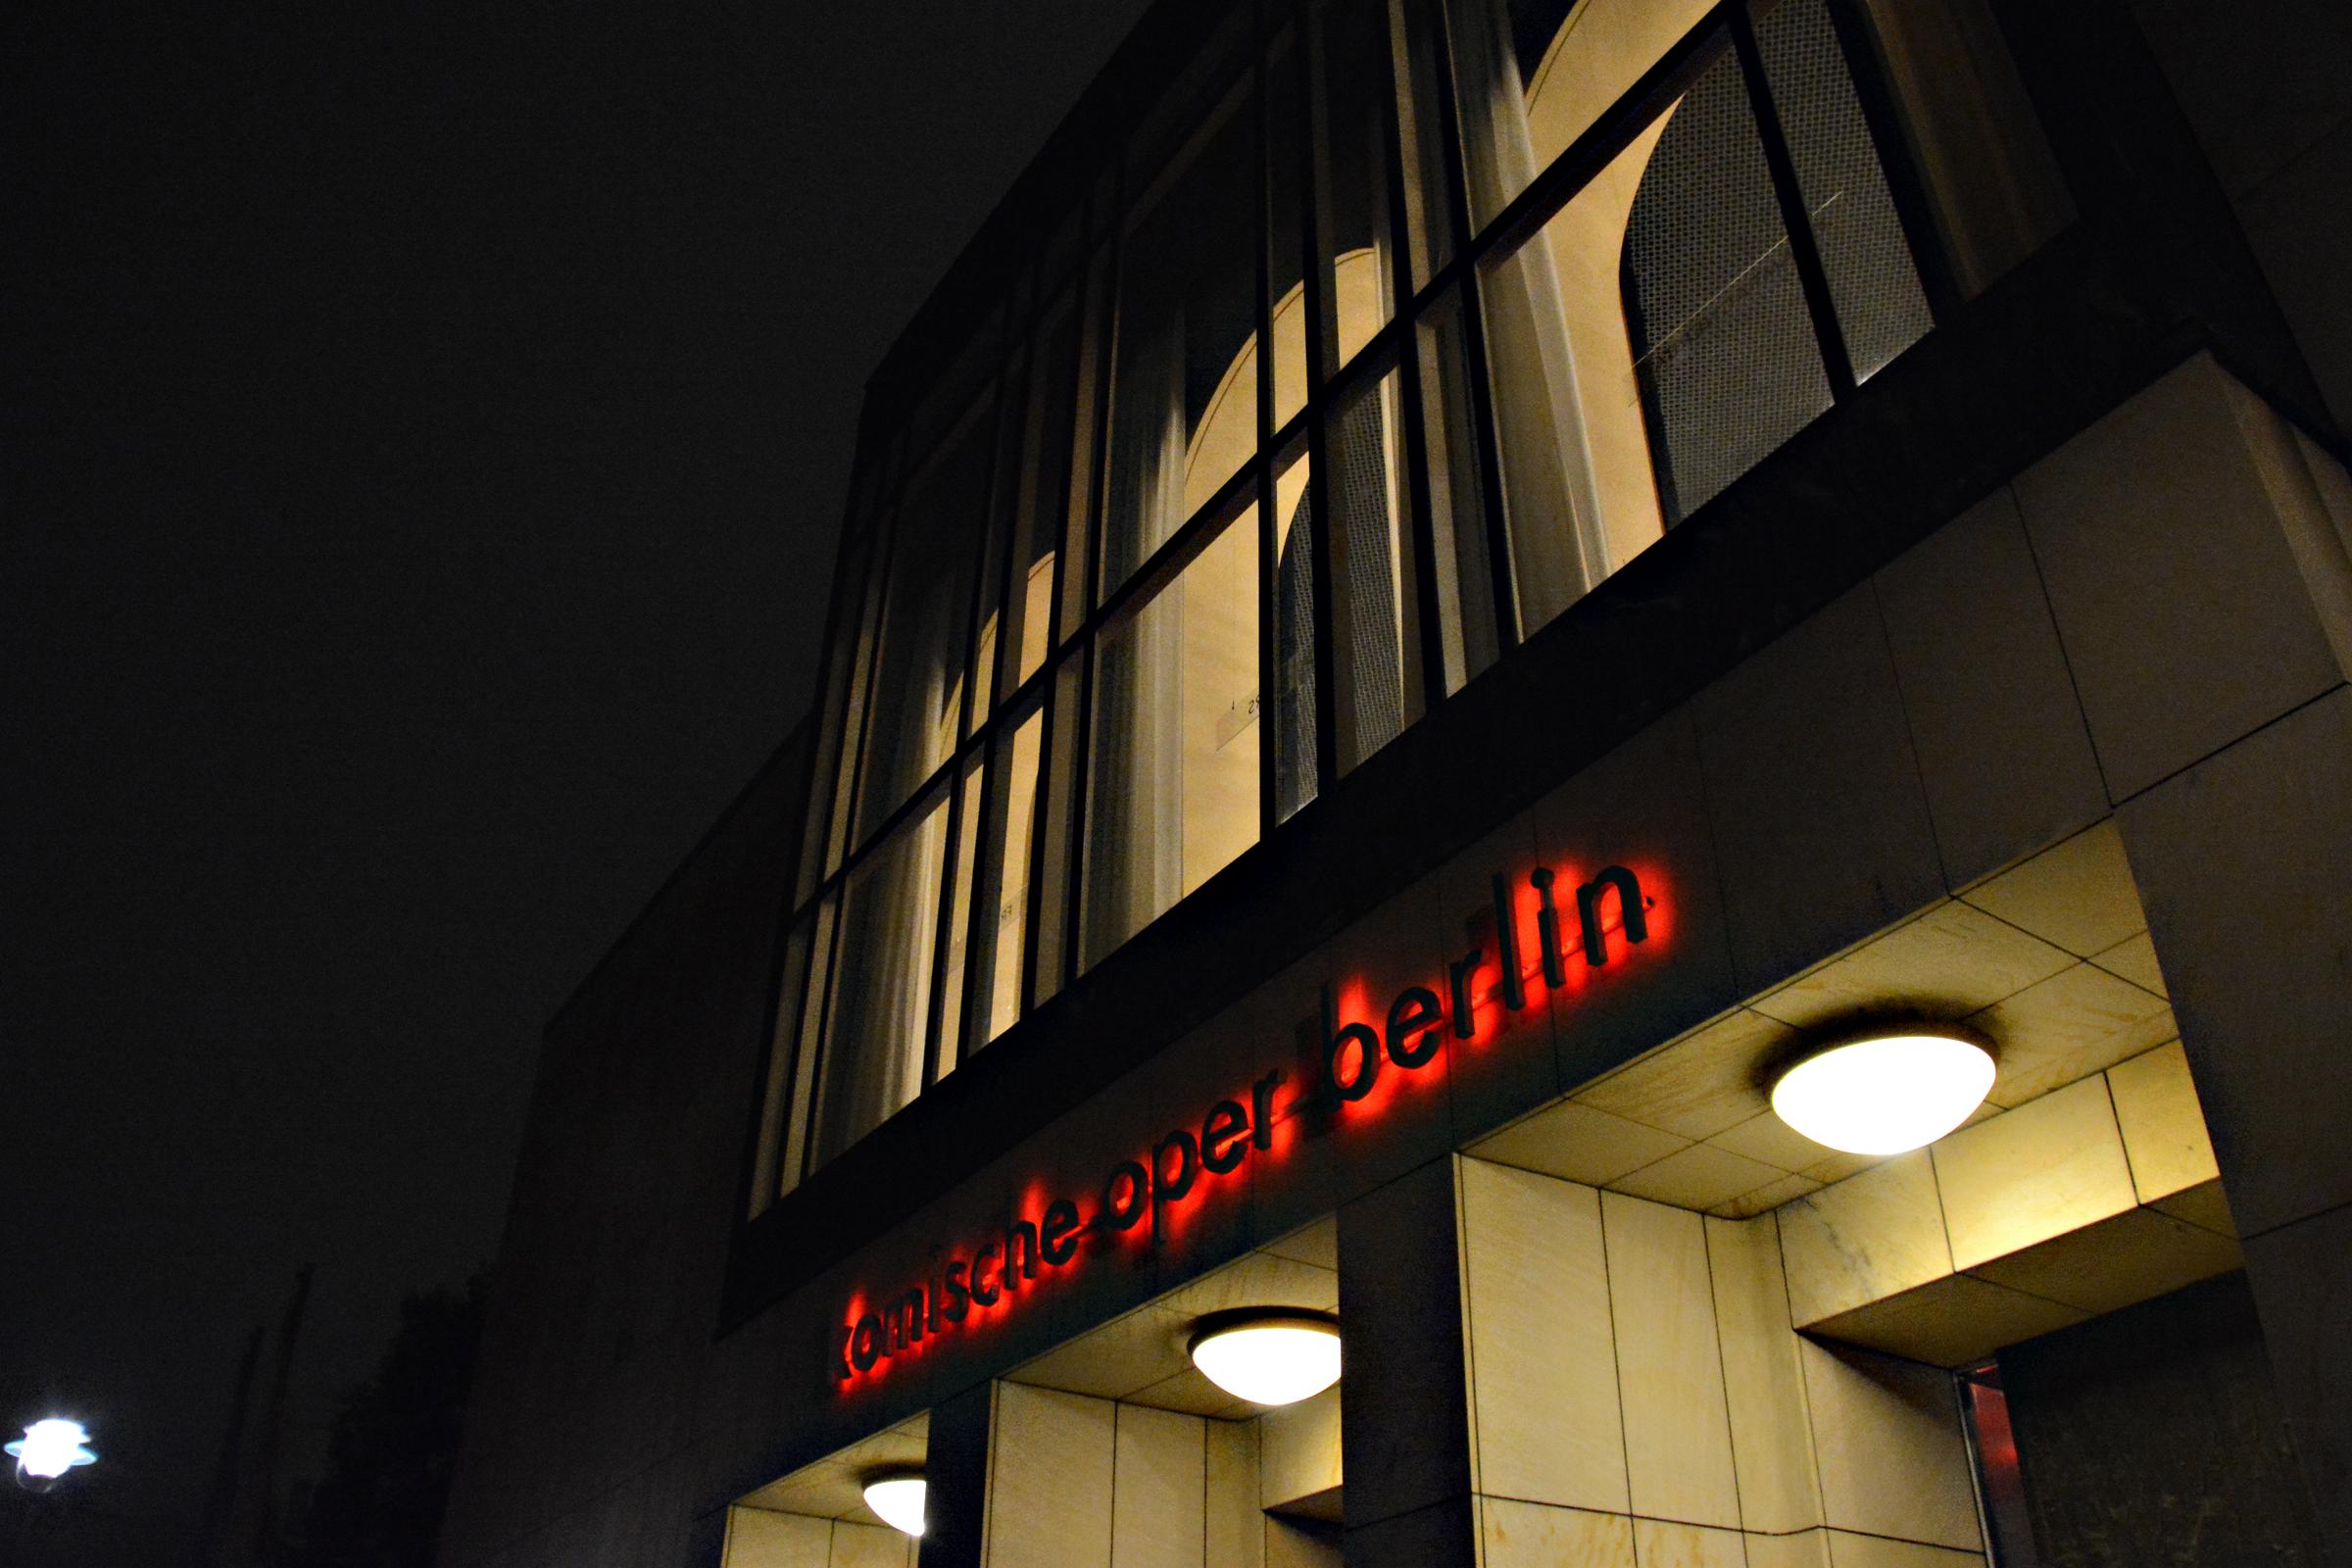 Komische Oper Berlin. Foto: Ulrich horb